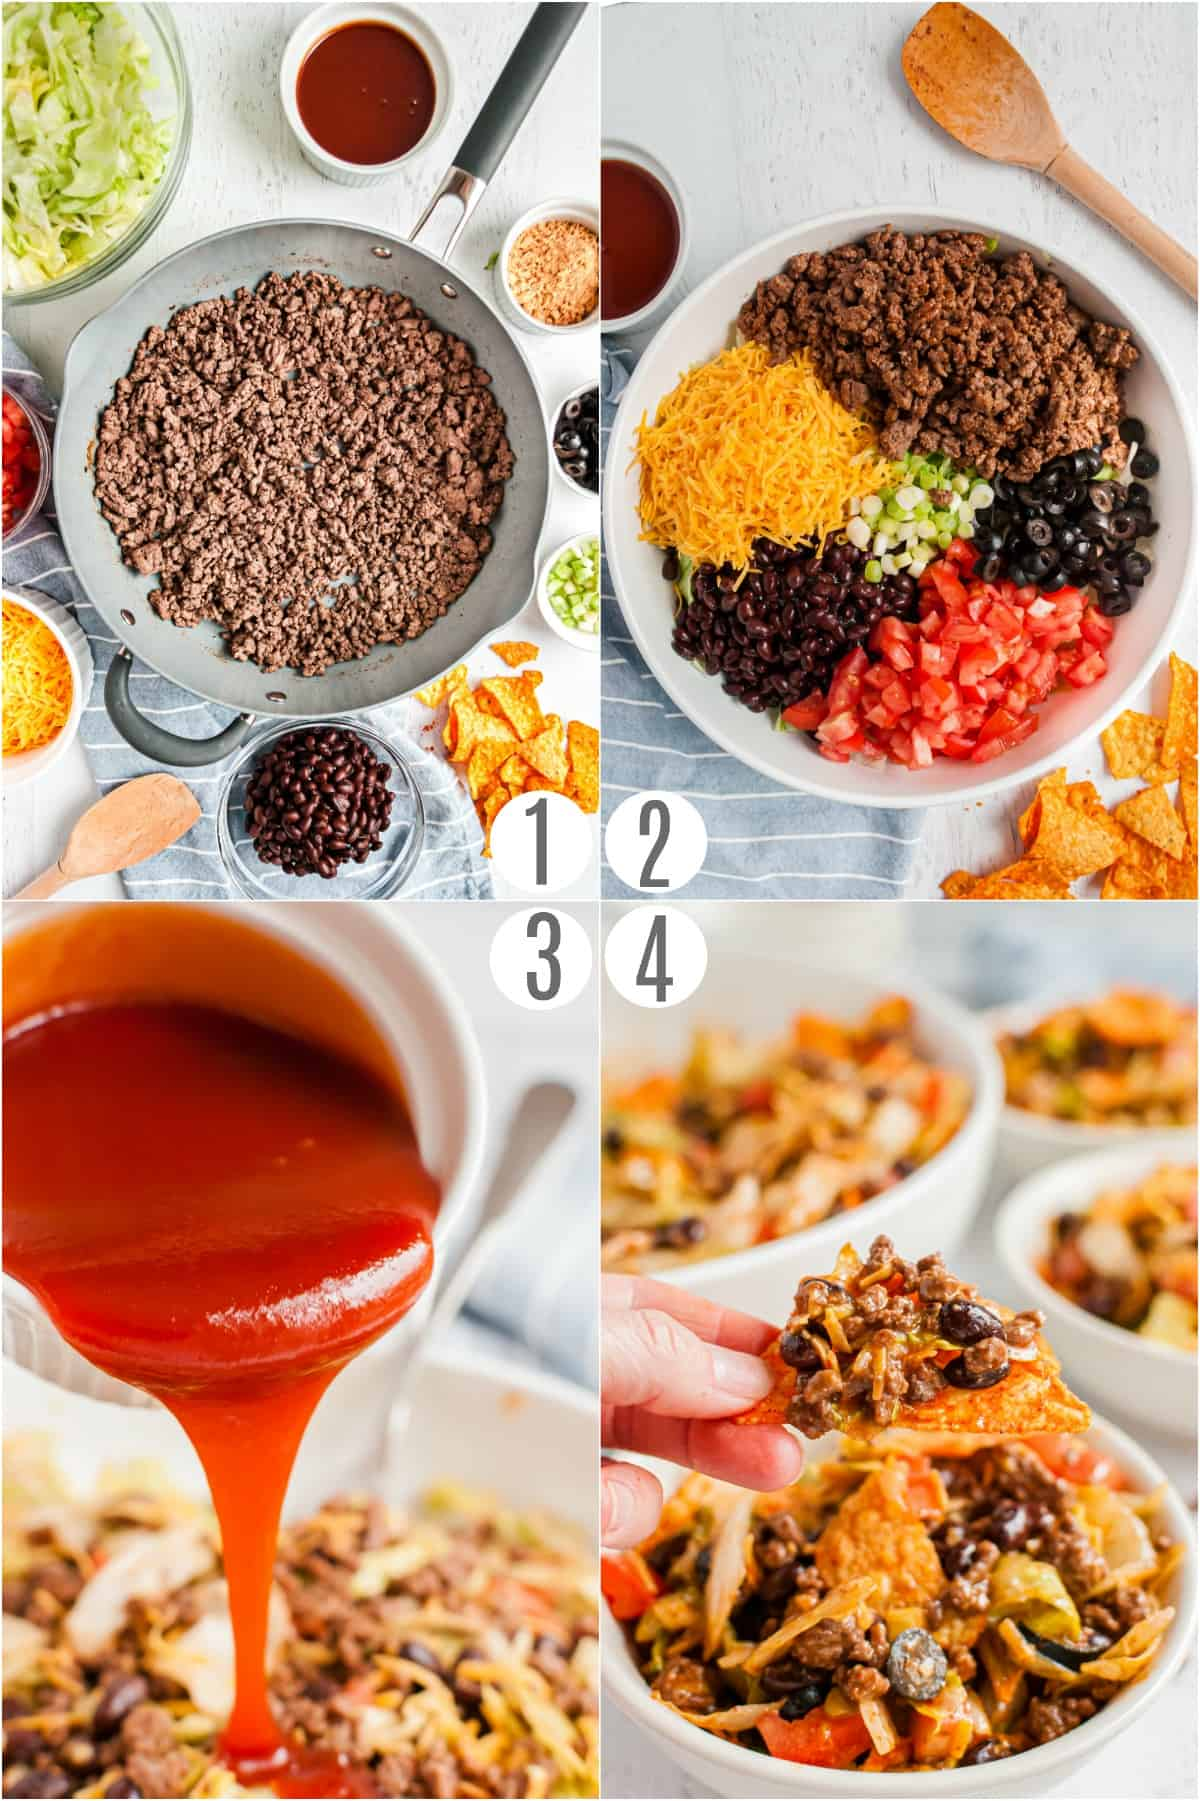 Step by step photos on how to make Dorito Taco Salad.